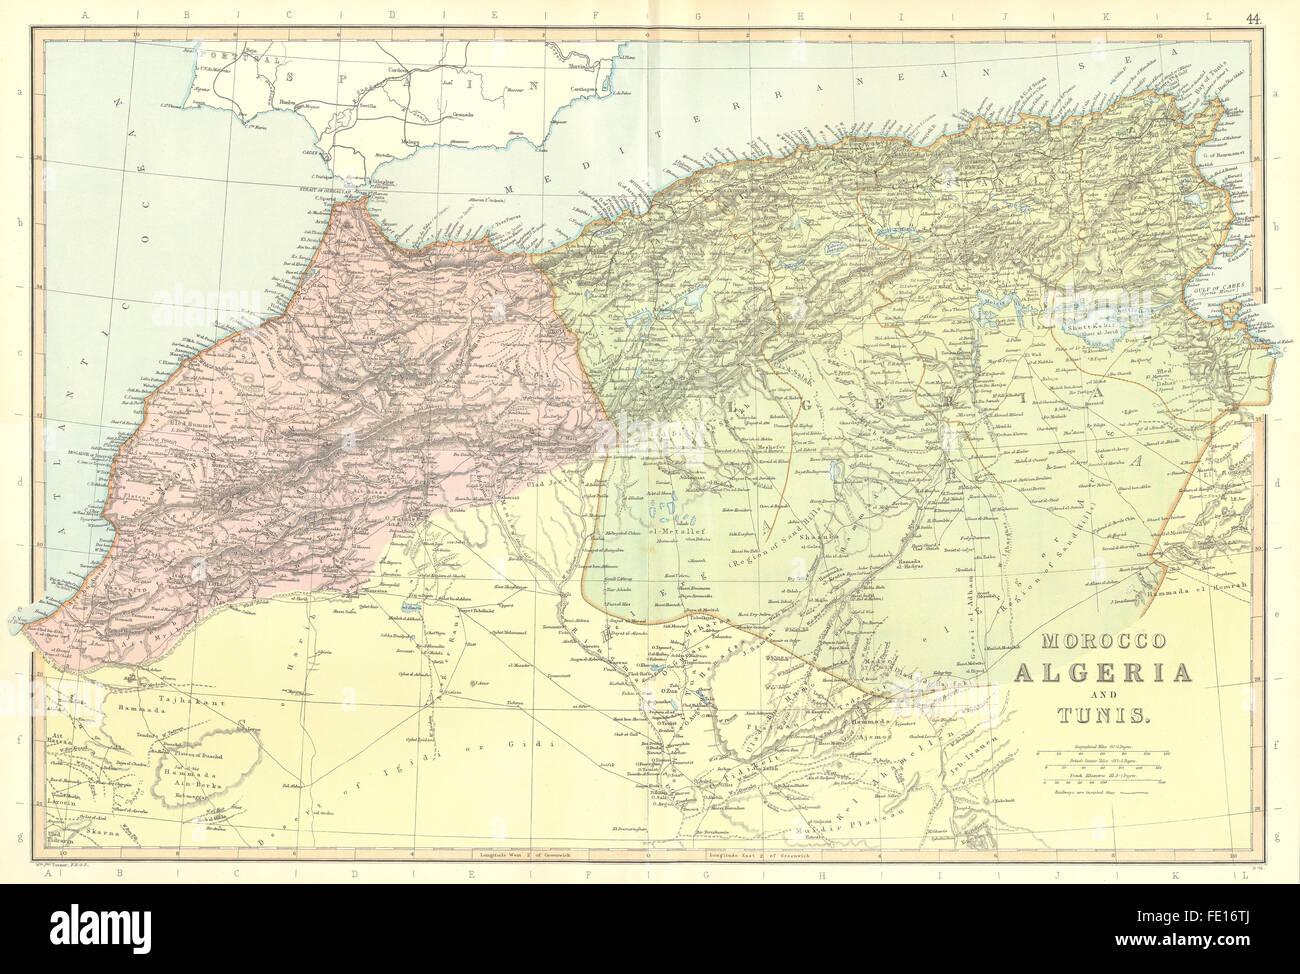 Tunisia North Africa Map.Mahgreb Morocco Algeria Tunisia North Africa Railways